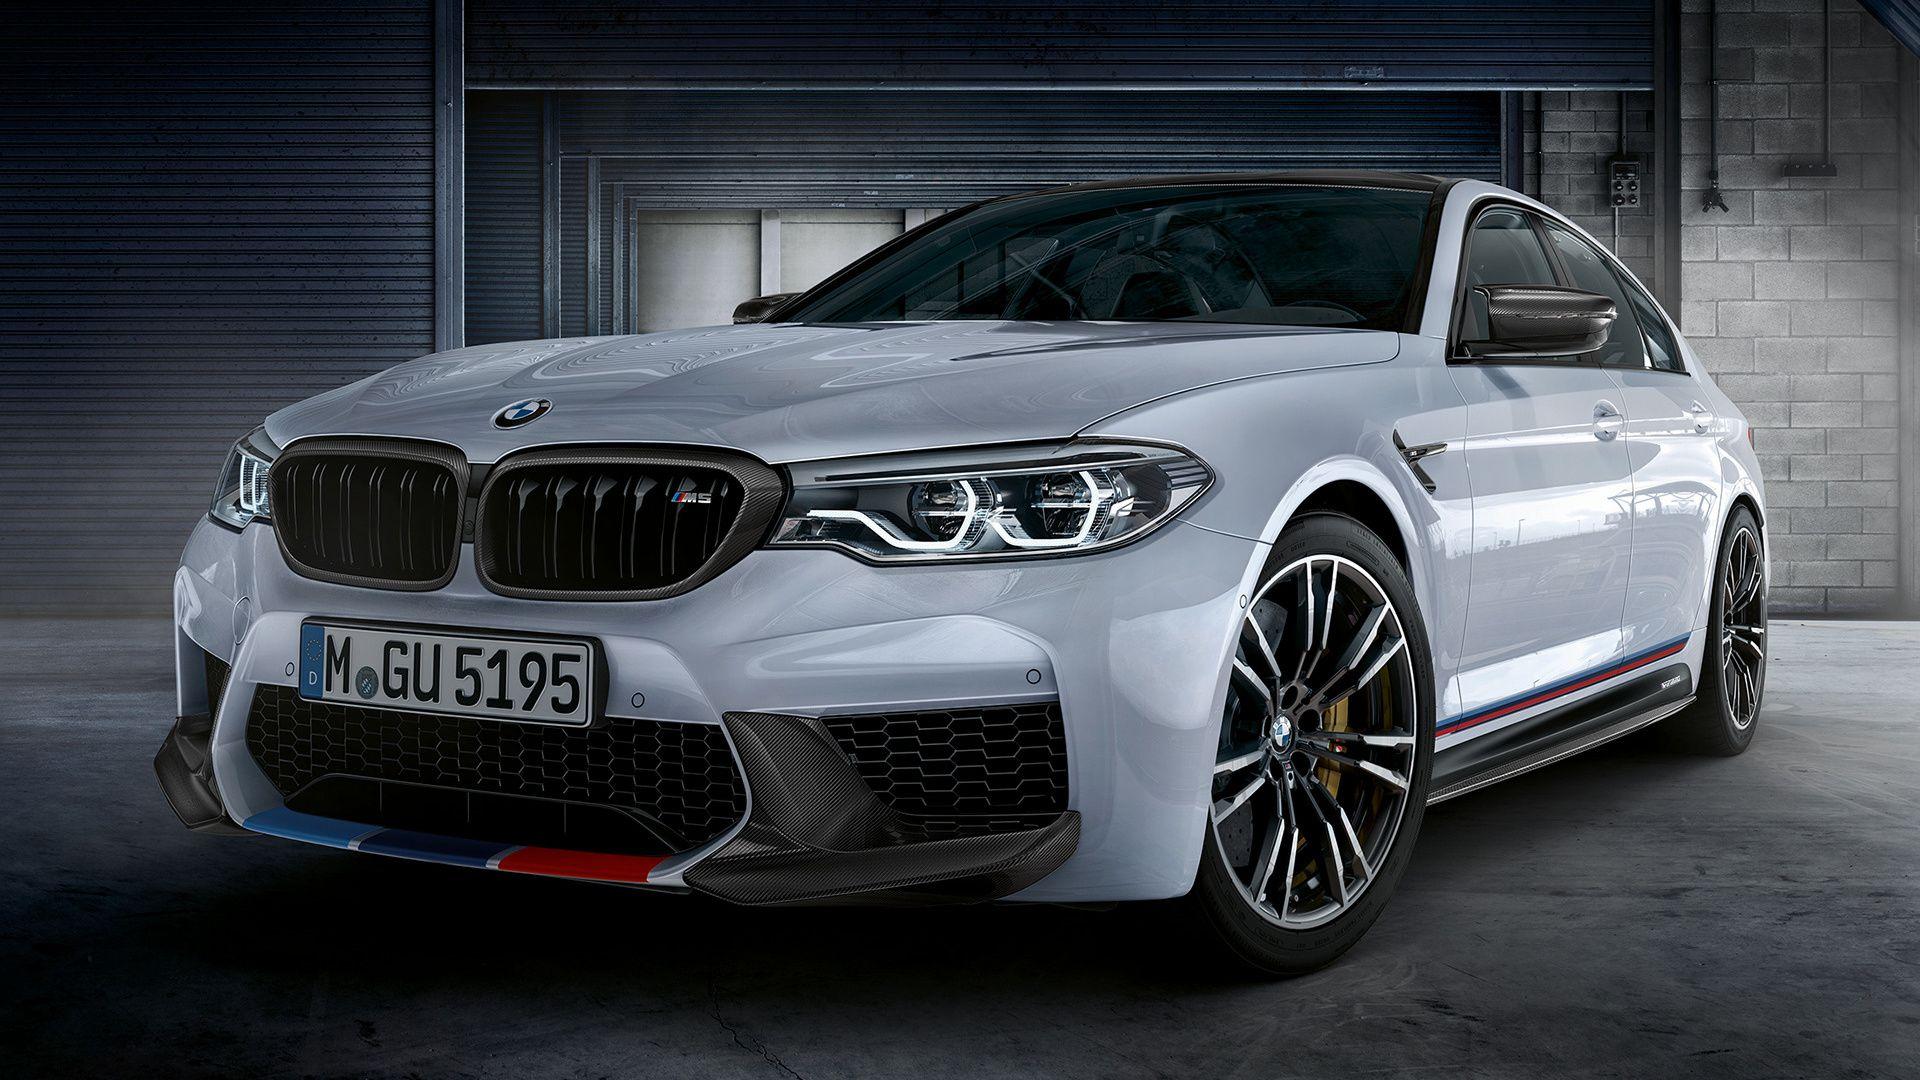 Bmw M Wallpaper Hd Bmw M5 Bmw Luxury Cars